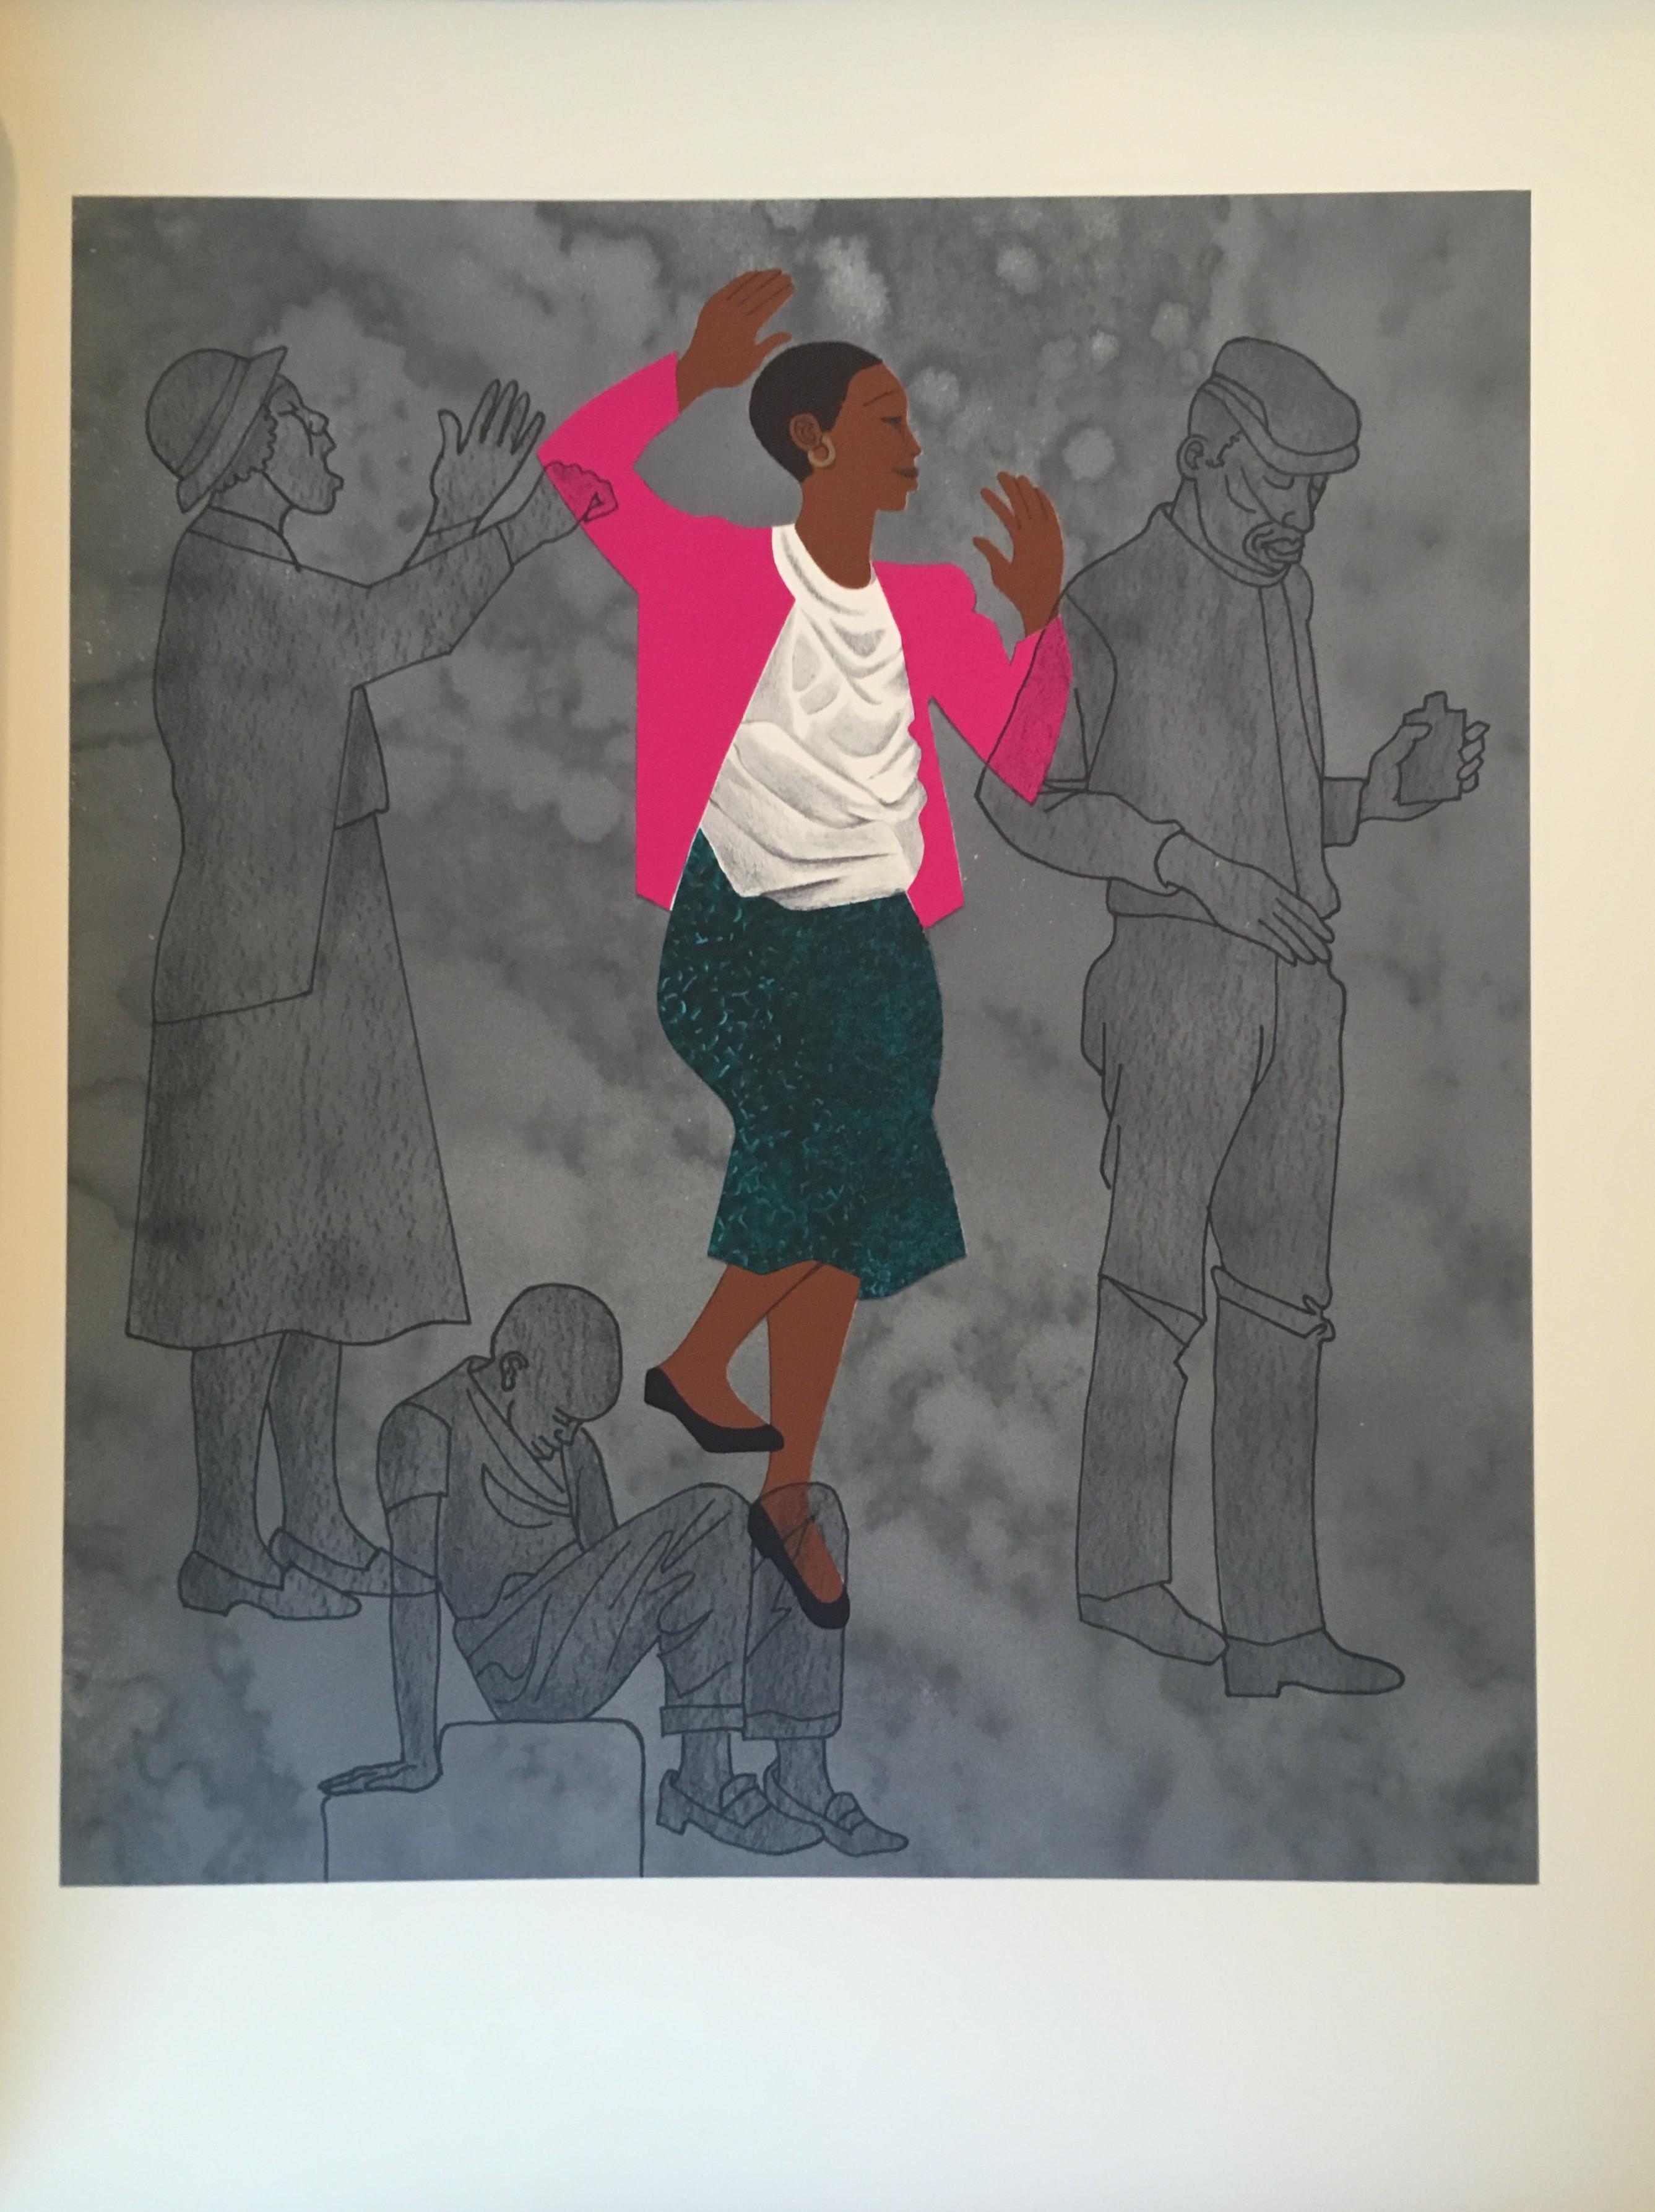 Lithograph by Elizabeth Catlett